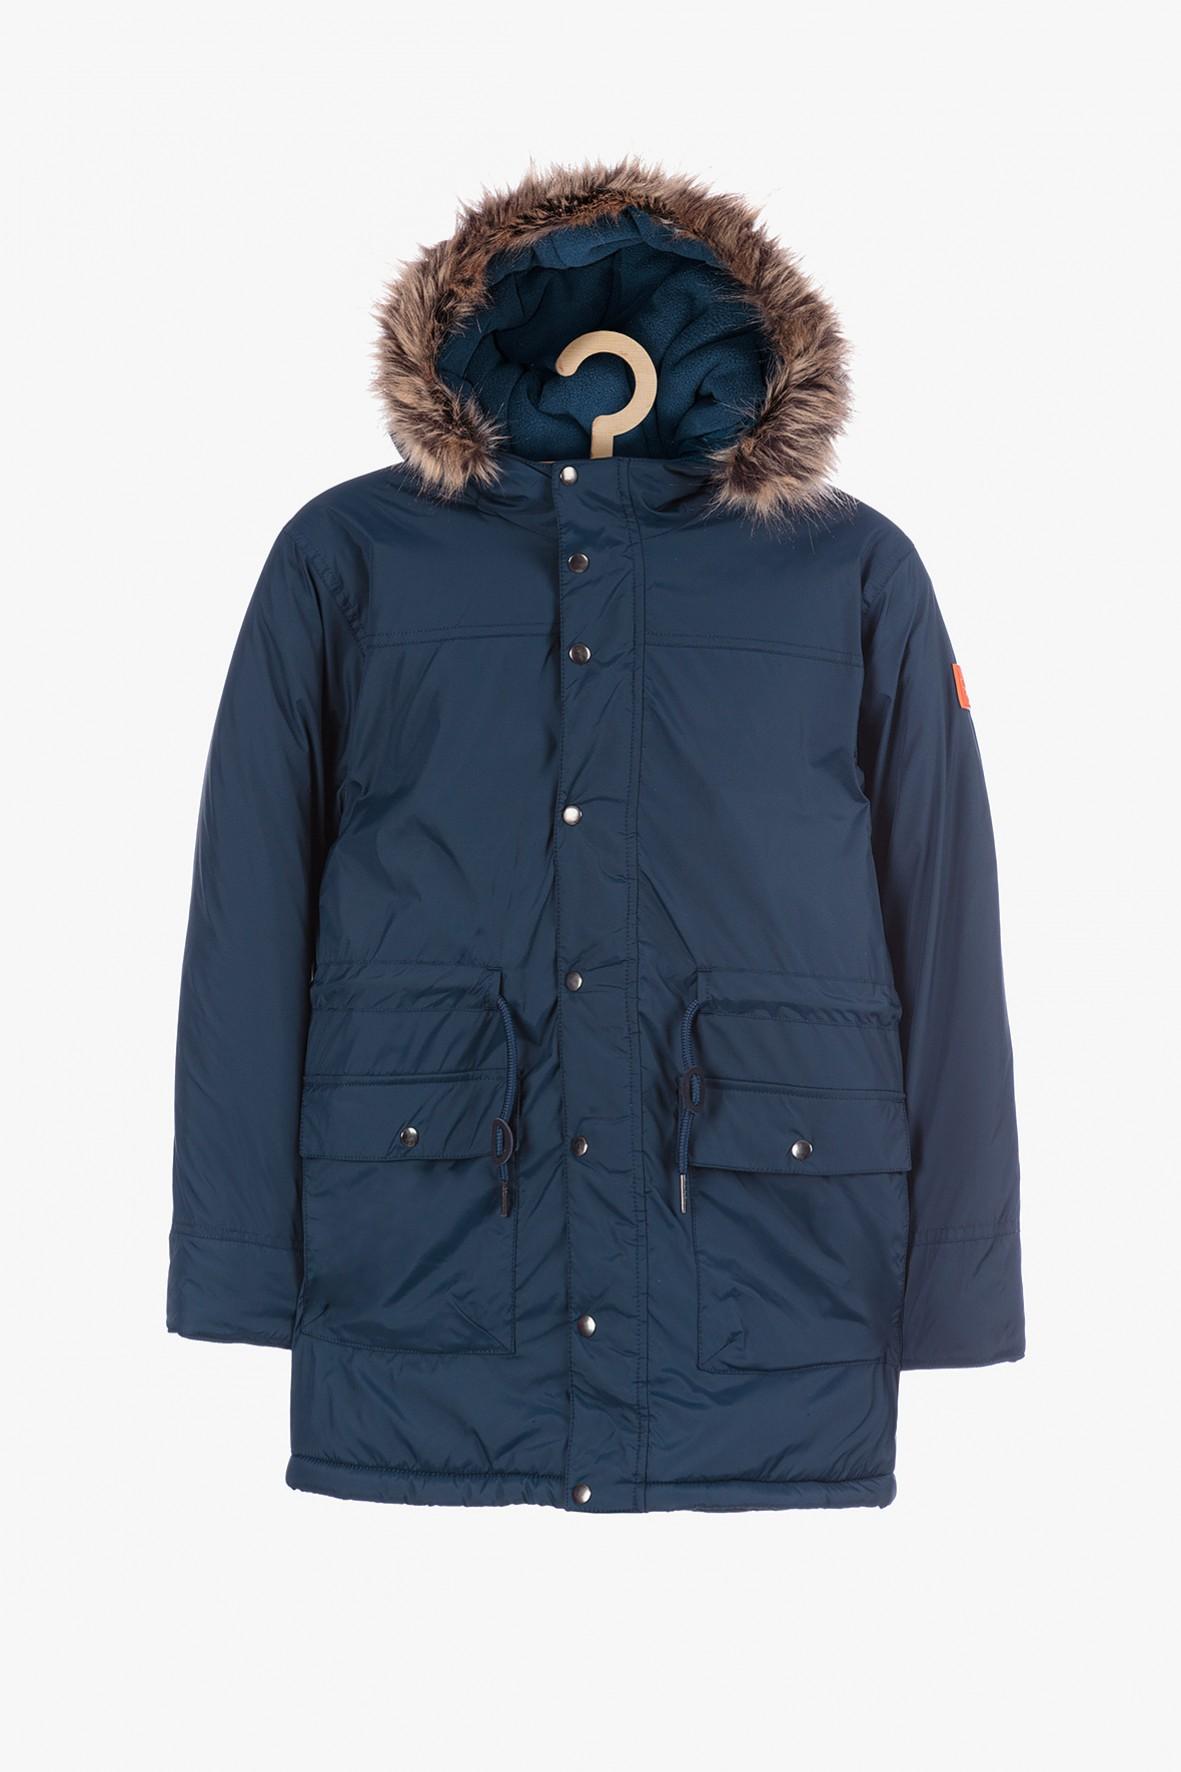 Granatowa kurtka zimowa dla chłopca